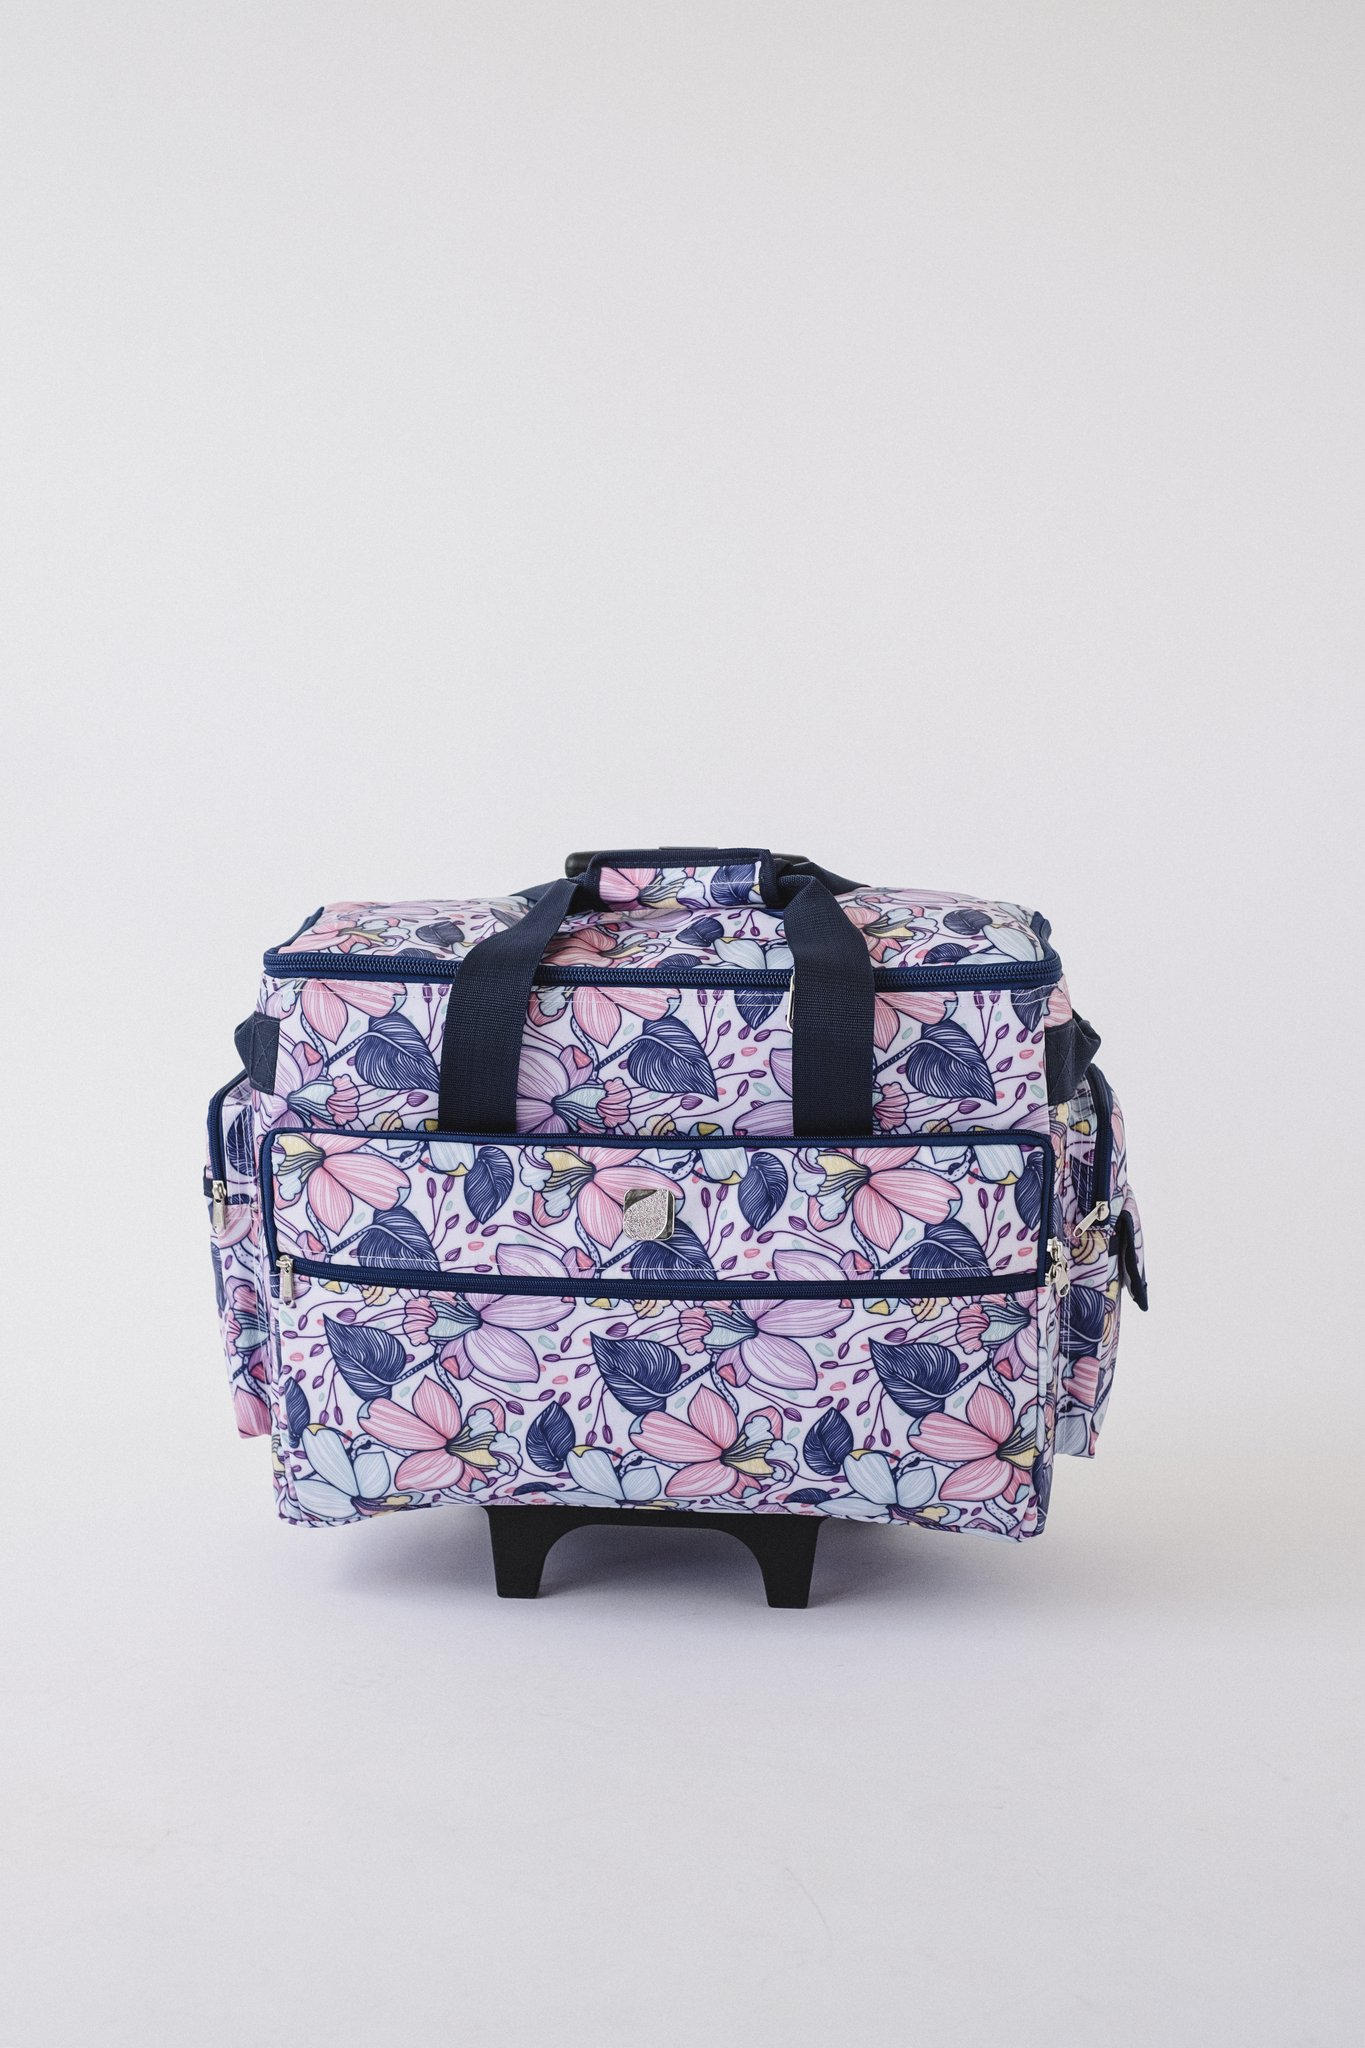 Bluefig Designer Series 19 Wheeled Machine Bag - Maisy